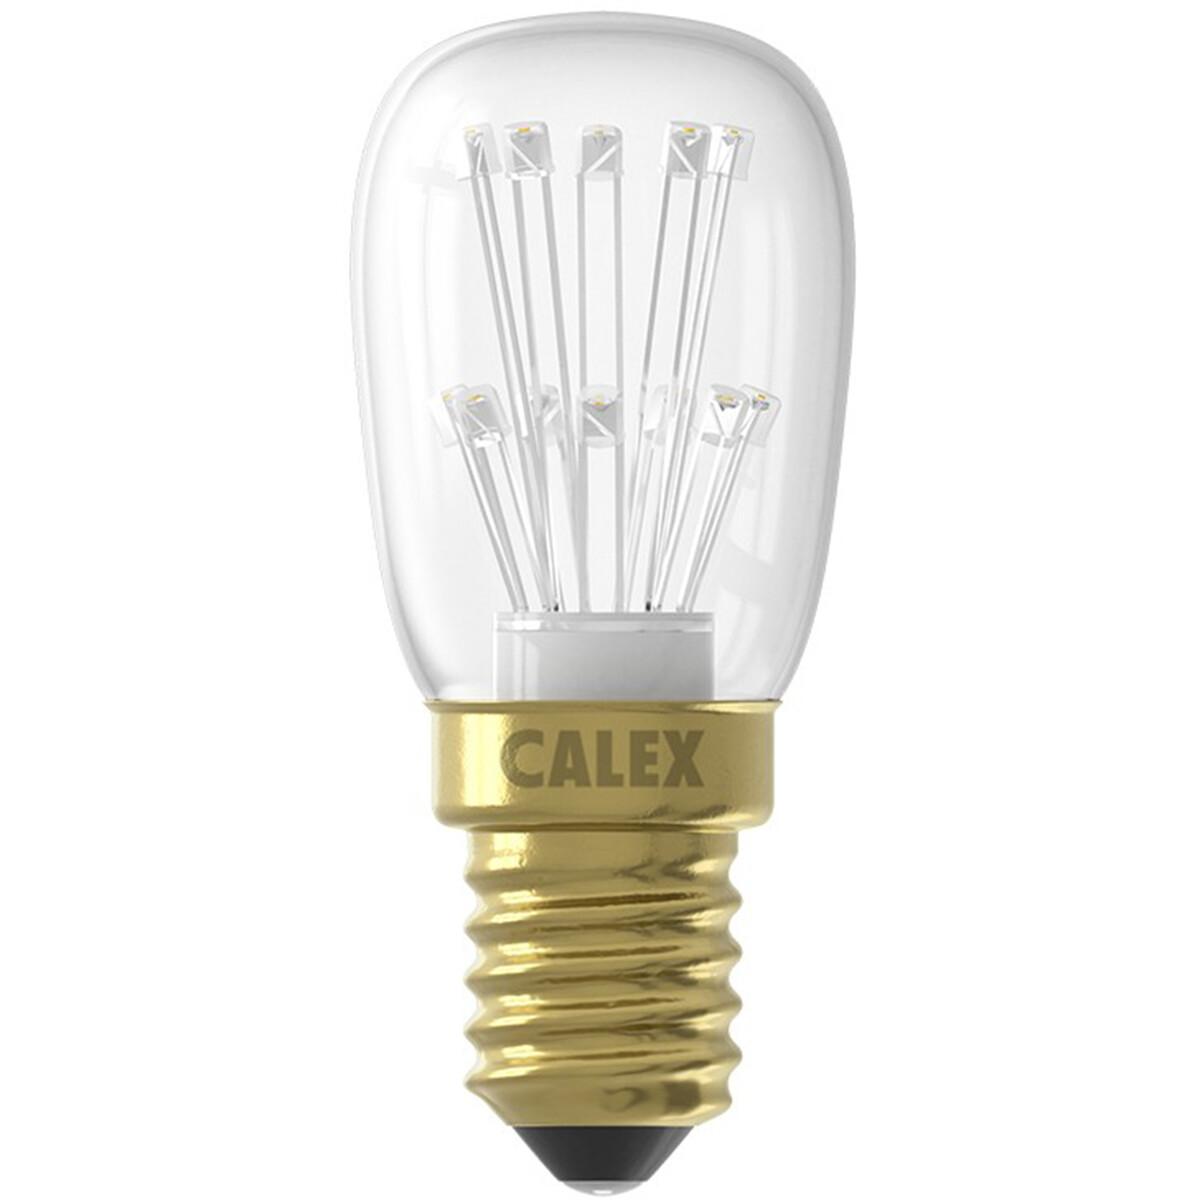 CALEX - LED Lamp - Schakelbord T26 - E14 Fitting - 1W - Warm Wit 2100K - Transparant Helder